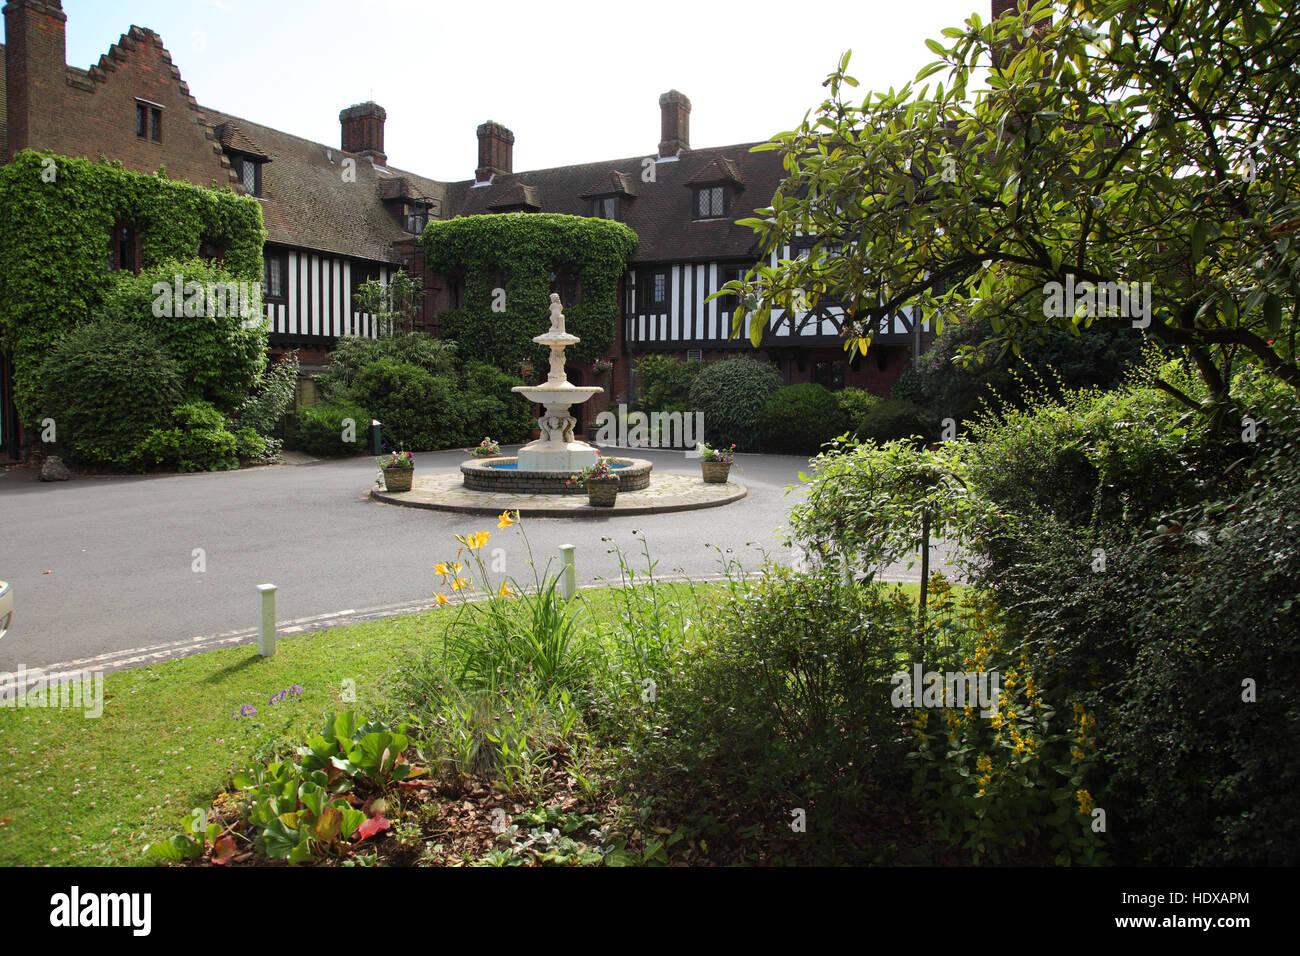 Hogarths Stone Manor Hotel, Kidderminster, Worcestershire - Stock Image